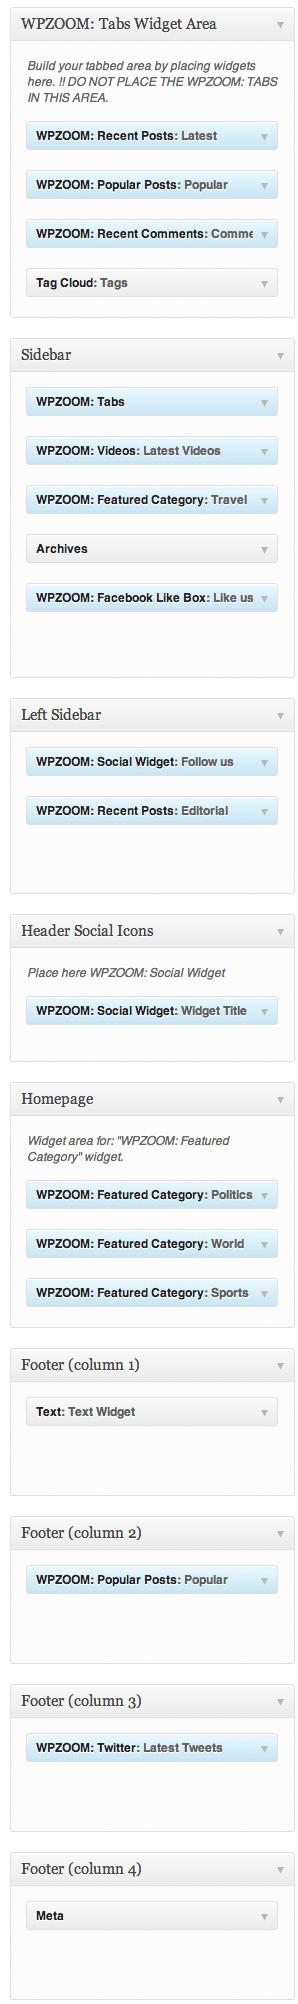 alpha-widgets